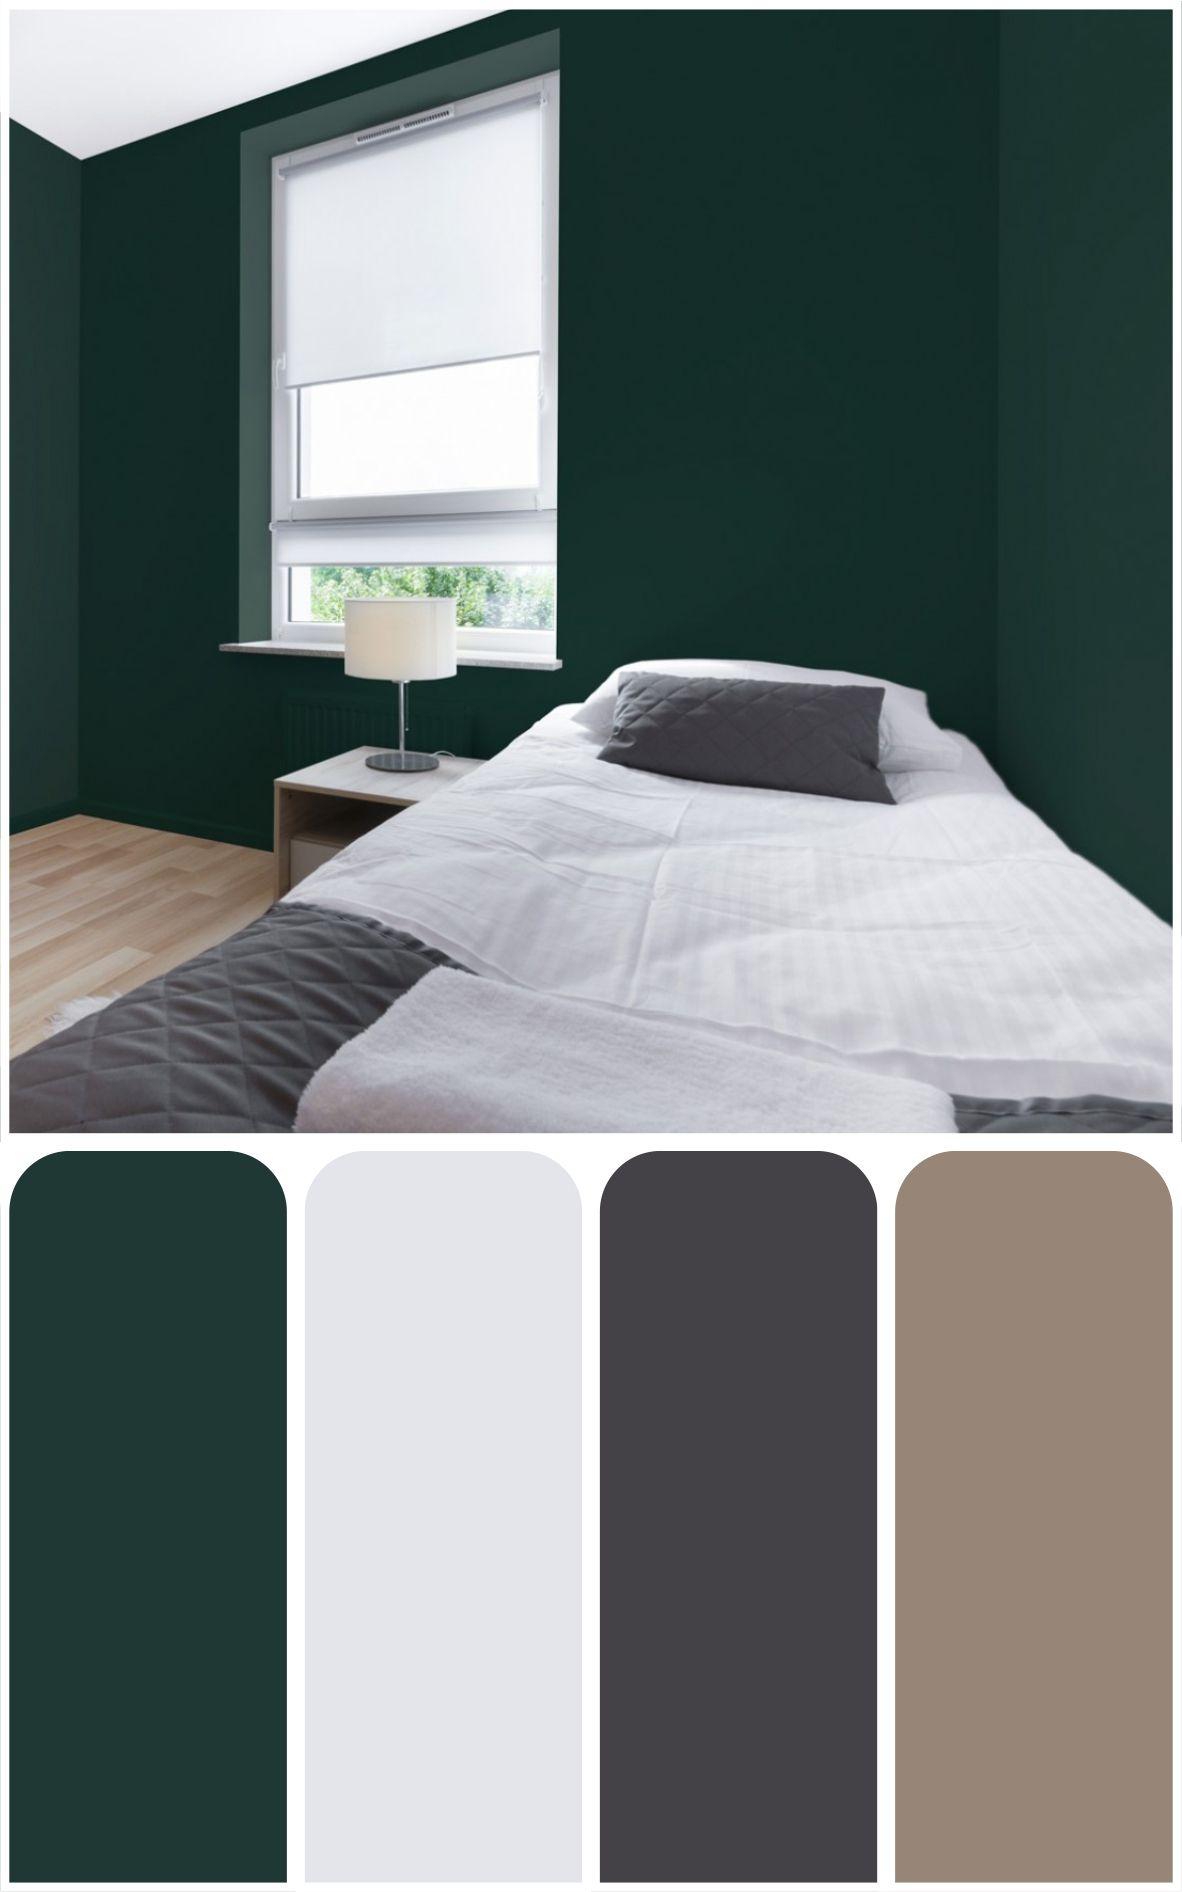 Bedroom Colour Ideas With Dark Green Wall Bedroomcolors Bedroomcolorschemes Bedroomcolorideas Green Bedroom Colors Green Bedroom Walls Green Master Bedroom